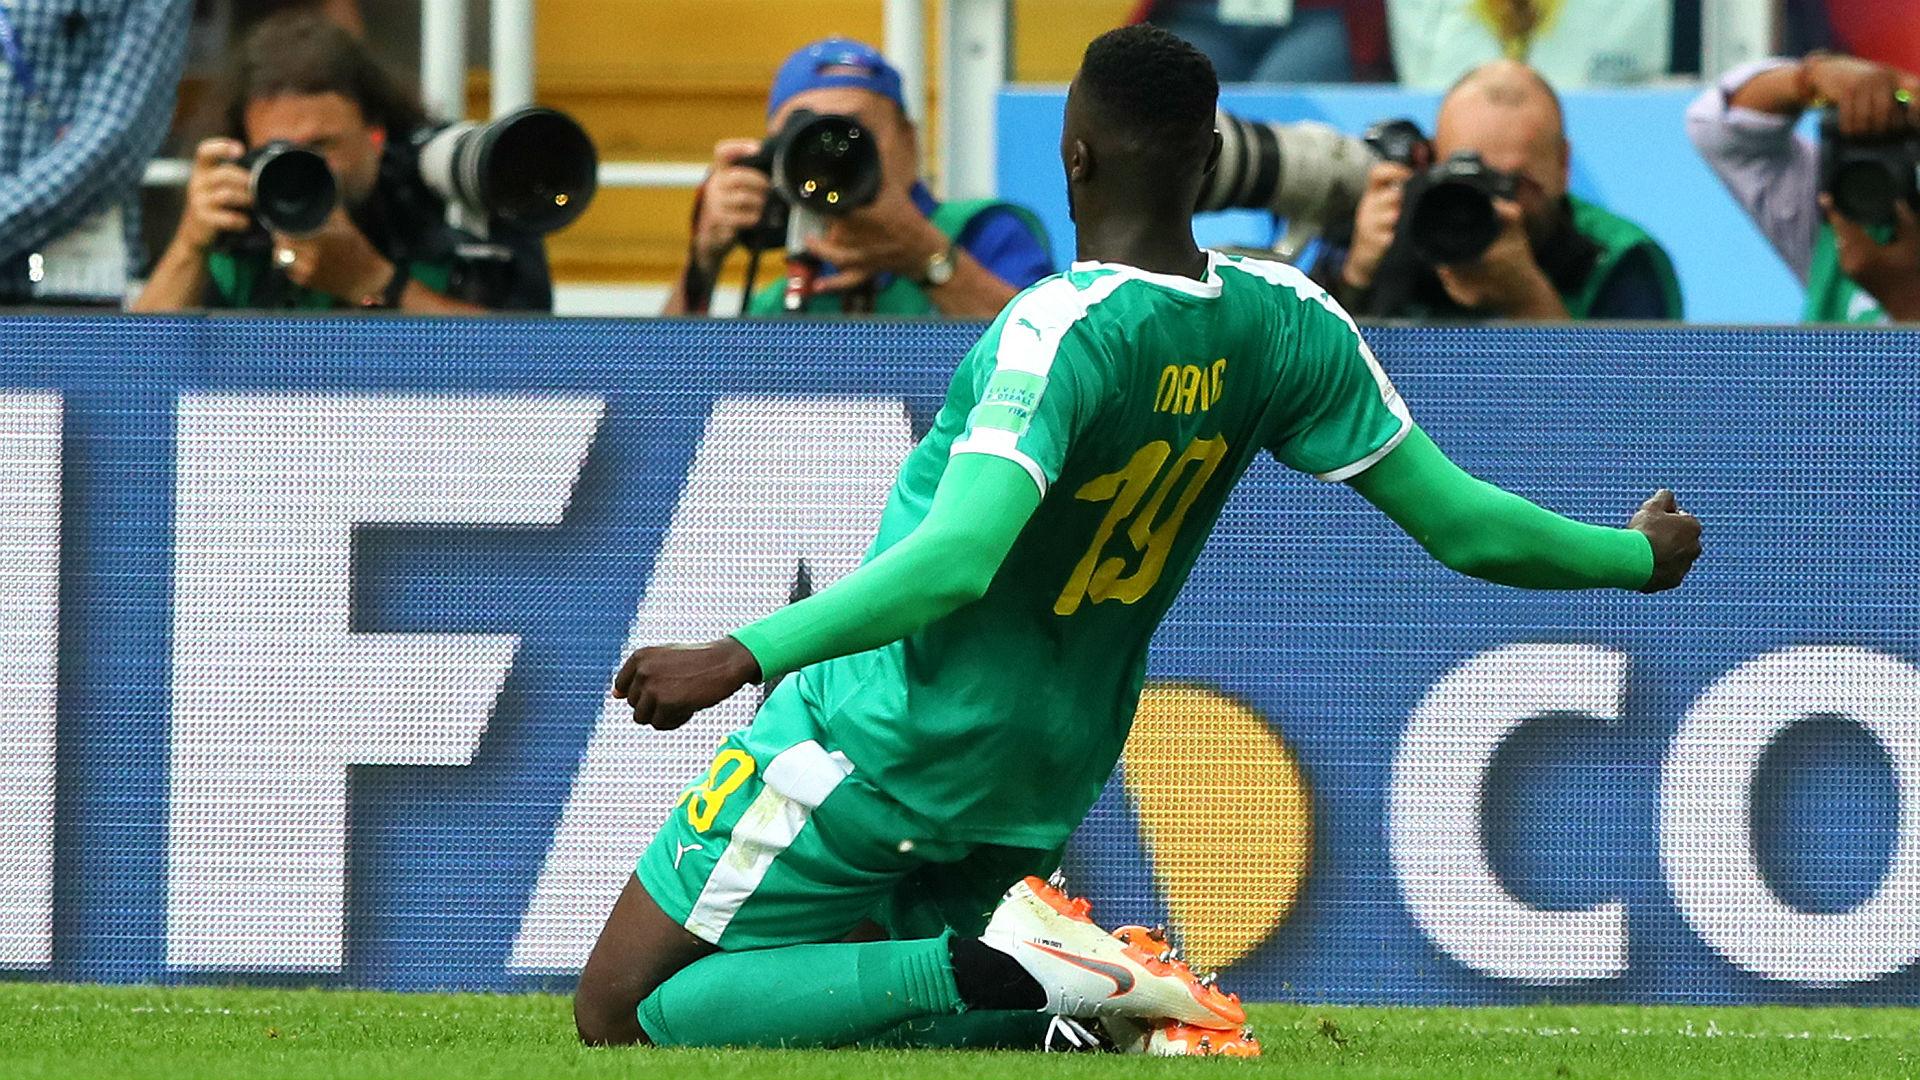 Injured Player Scores Senegals Game Winning Goal Vs Poland